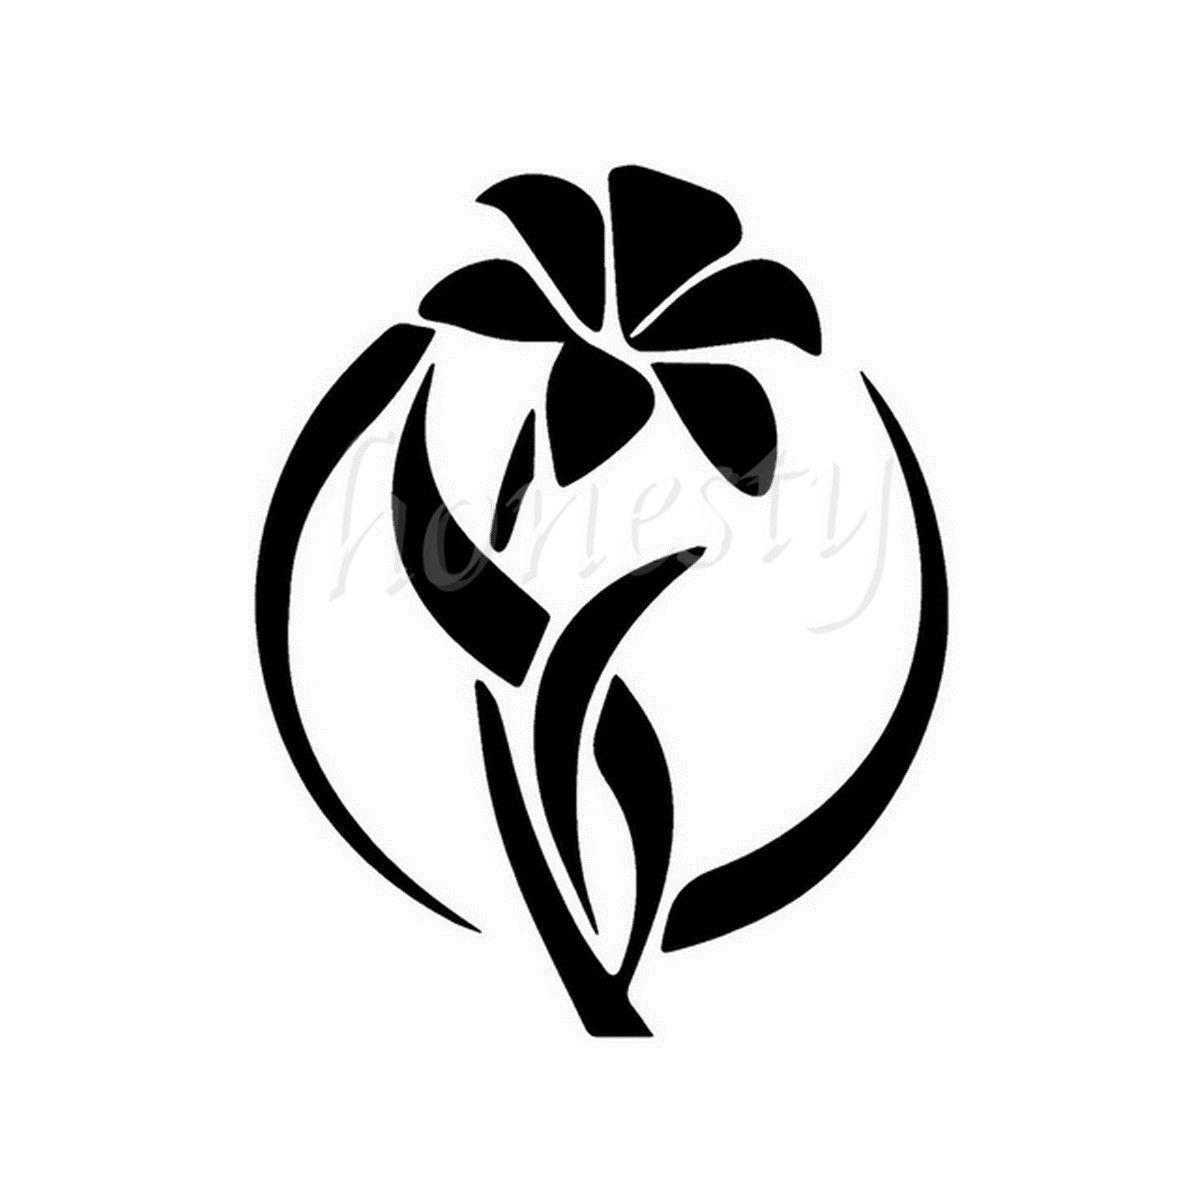 Charming lily flower wall home glass window door car sticker laptop charming lily flower wall home glass window door car sticker laptop auto truck black vinyl decal sticker decor 114cmx143cm in car stickers from izmirmasajfo